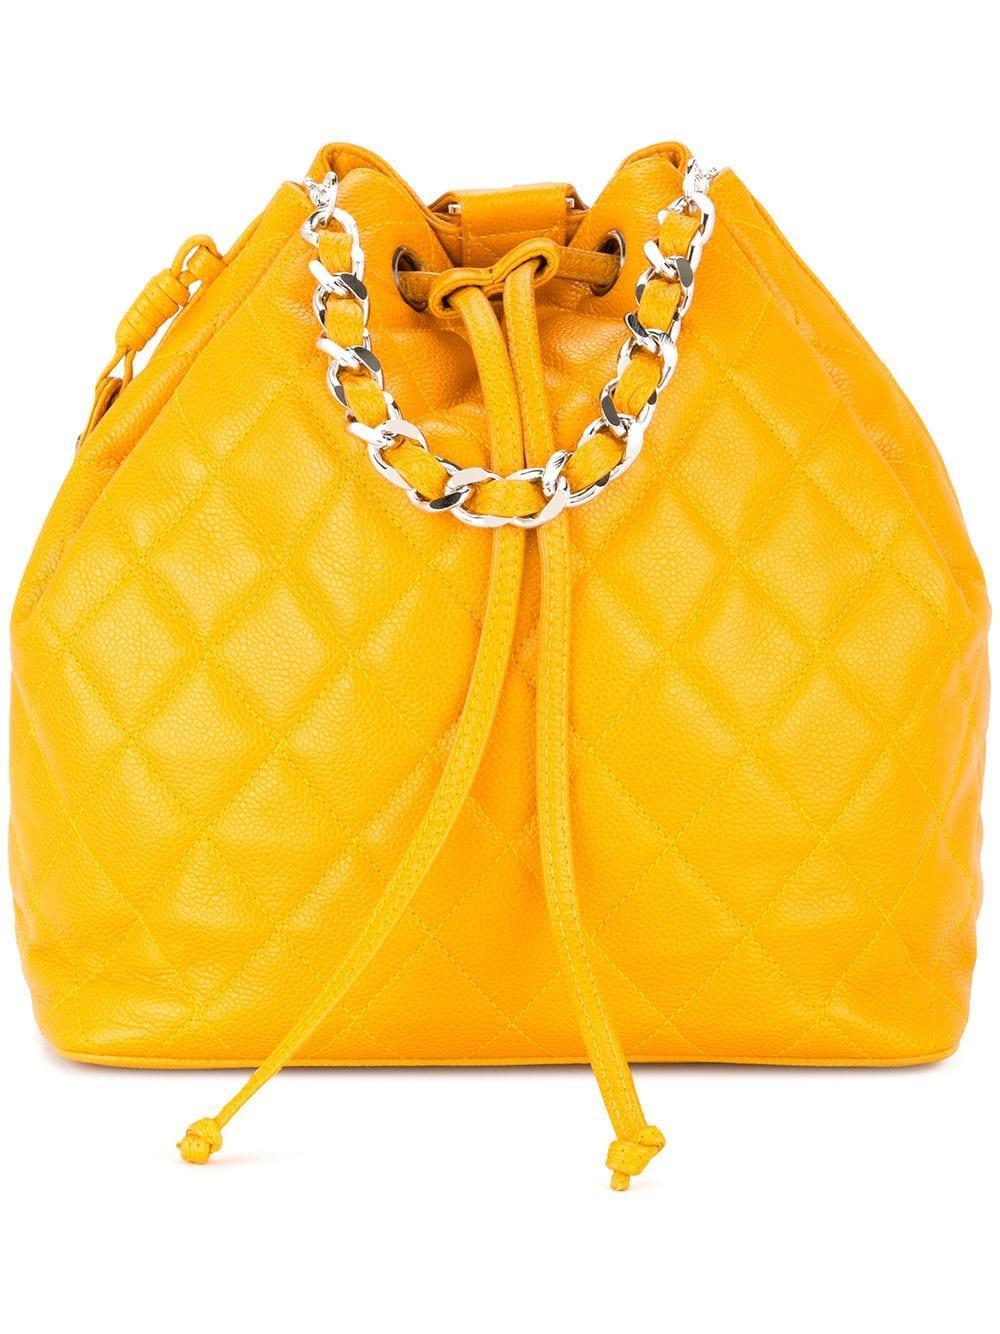 5b06a3a05817 Chanel Vintage Cc Chain Backpack Handbag - Farfetch In Orange | ModeSens